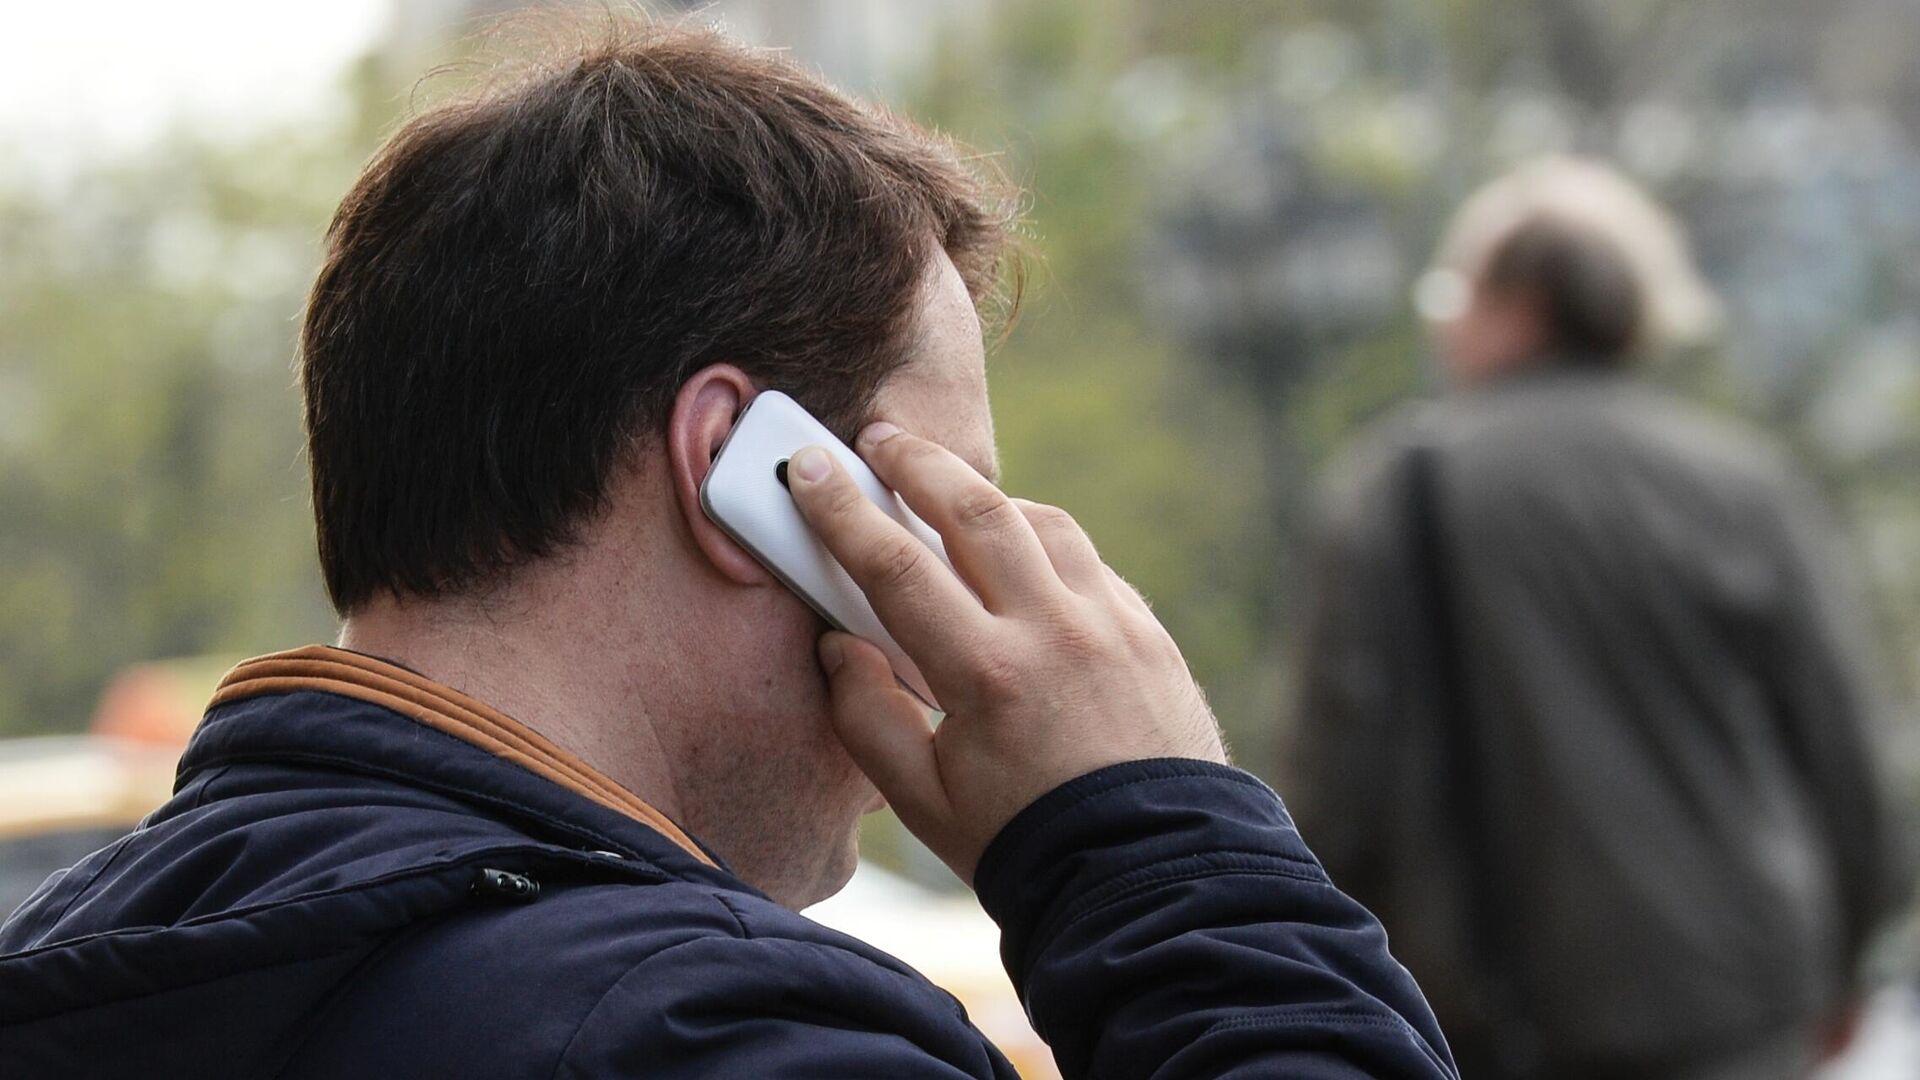 Мужчина говорит по телефону - Sputnik Latvija, 1920, 04.10.2021